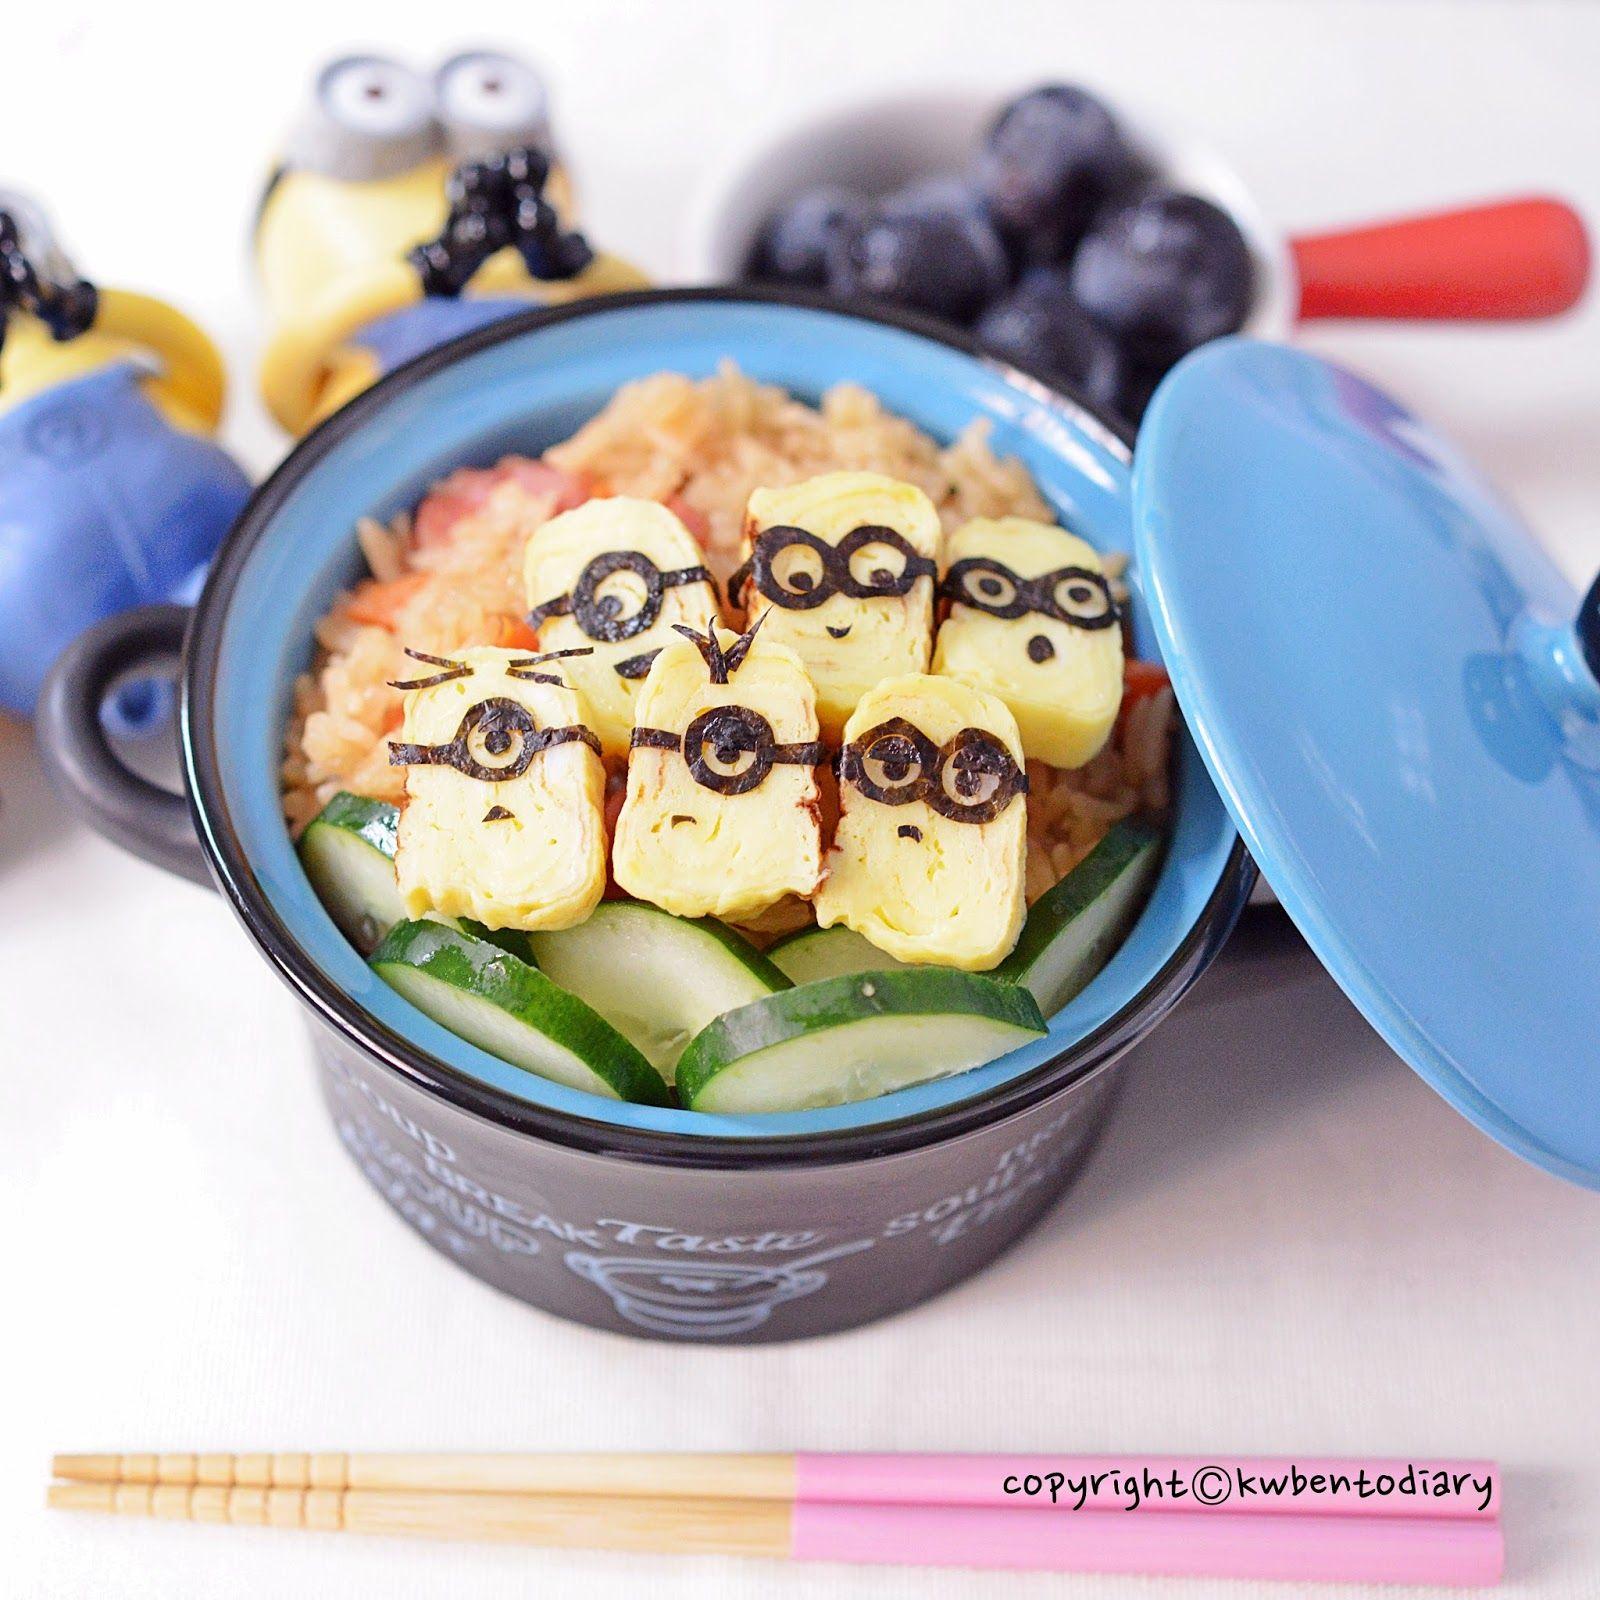 Karenwee's Bento Diary: Minions Tamagoyaki Food Art